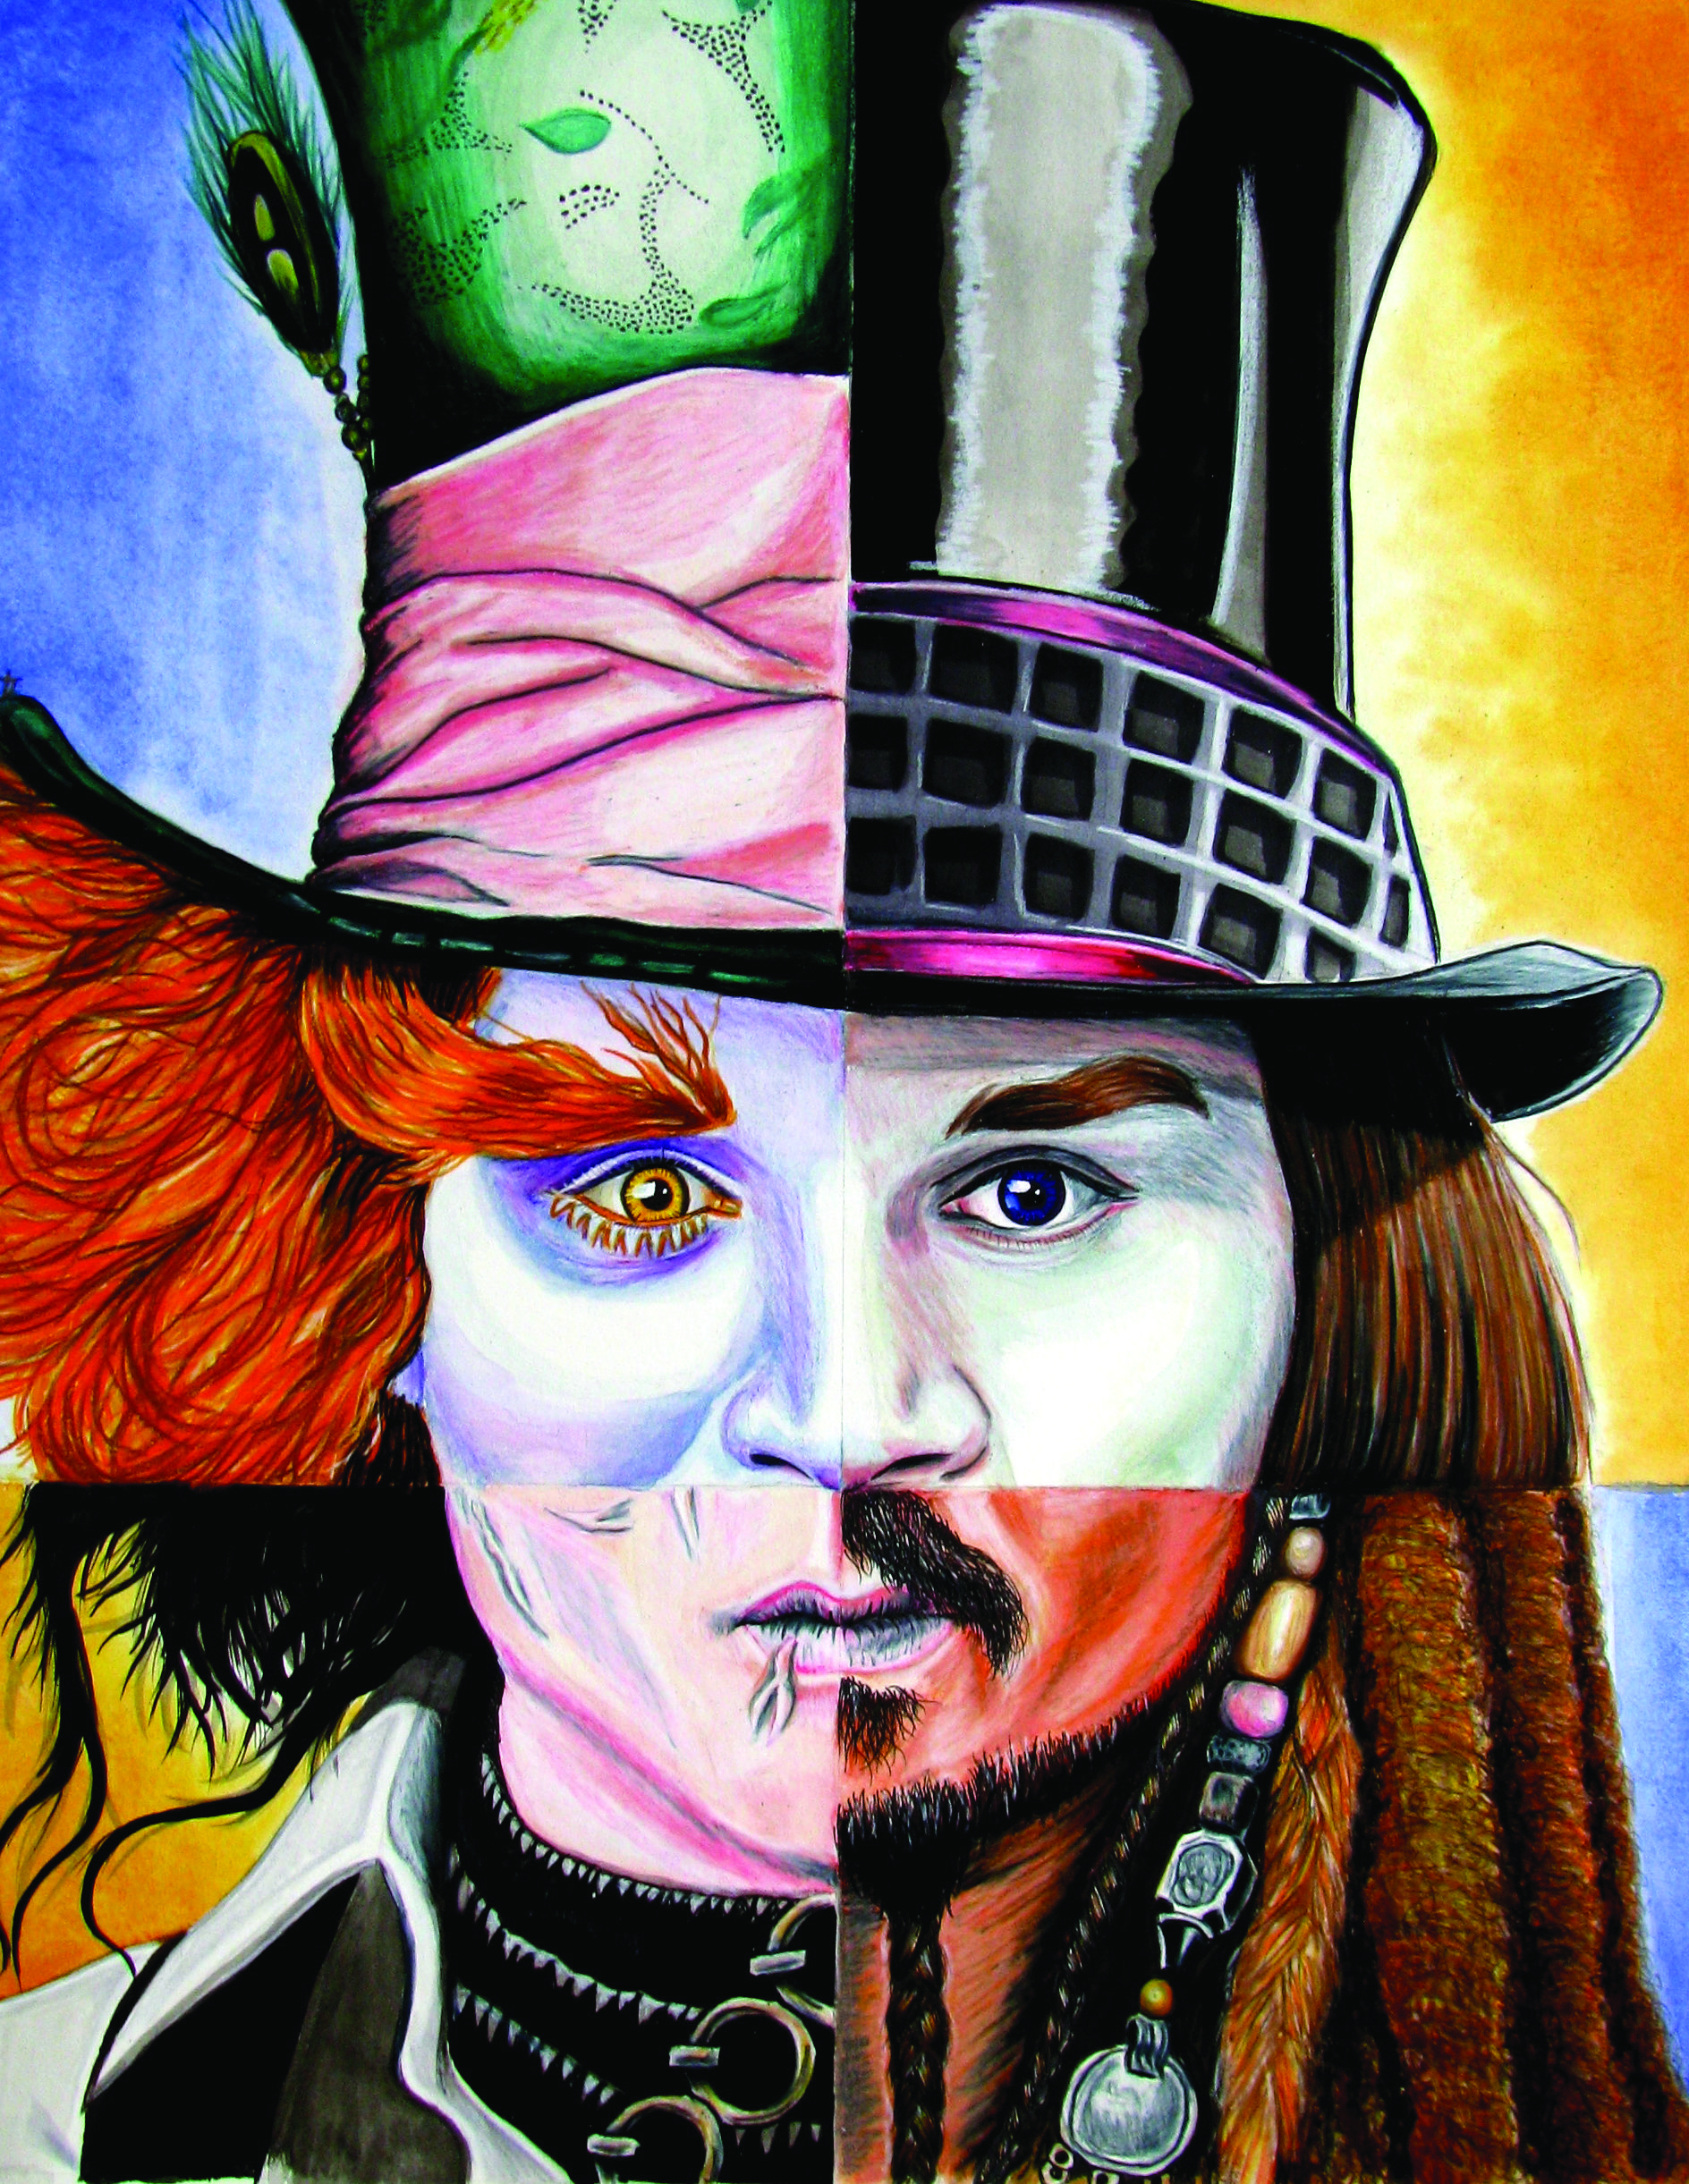 Johnny Depp' Characters Portrait Mixed Media Illustration Board Art